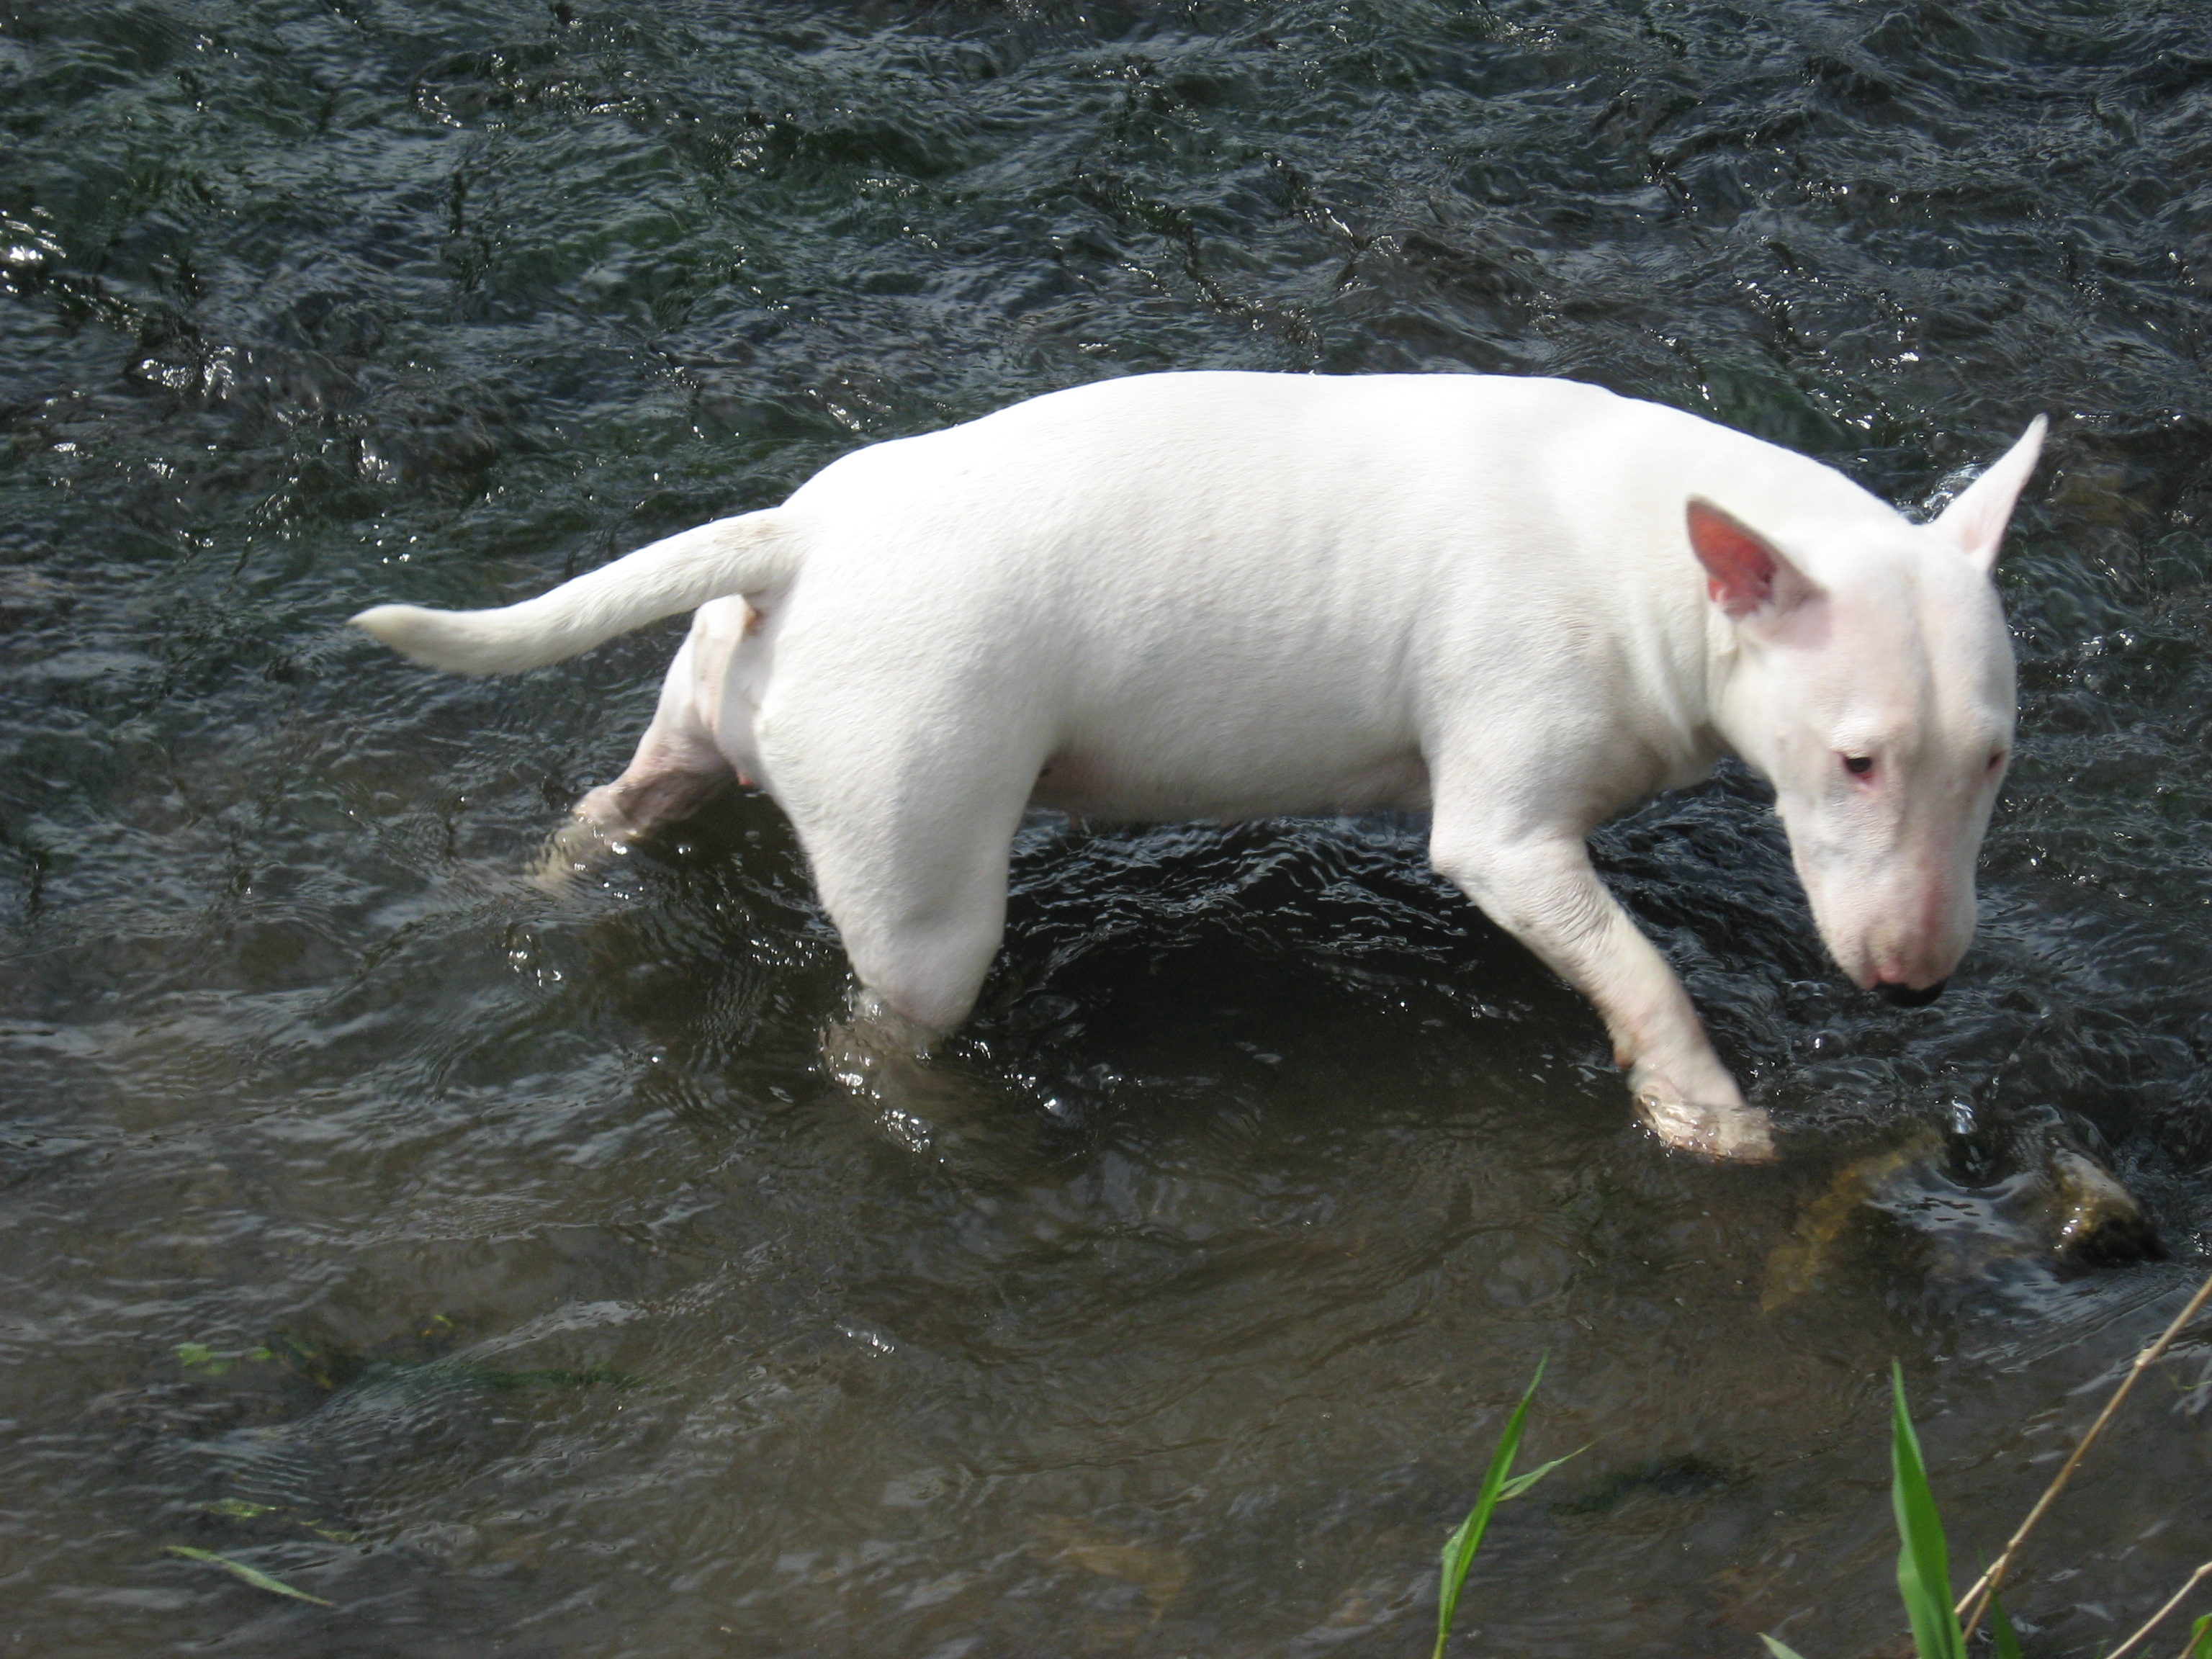 Miniatur Bullterrier durchquert das Wasser